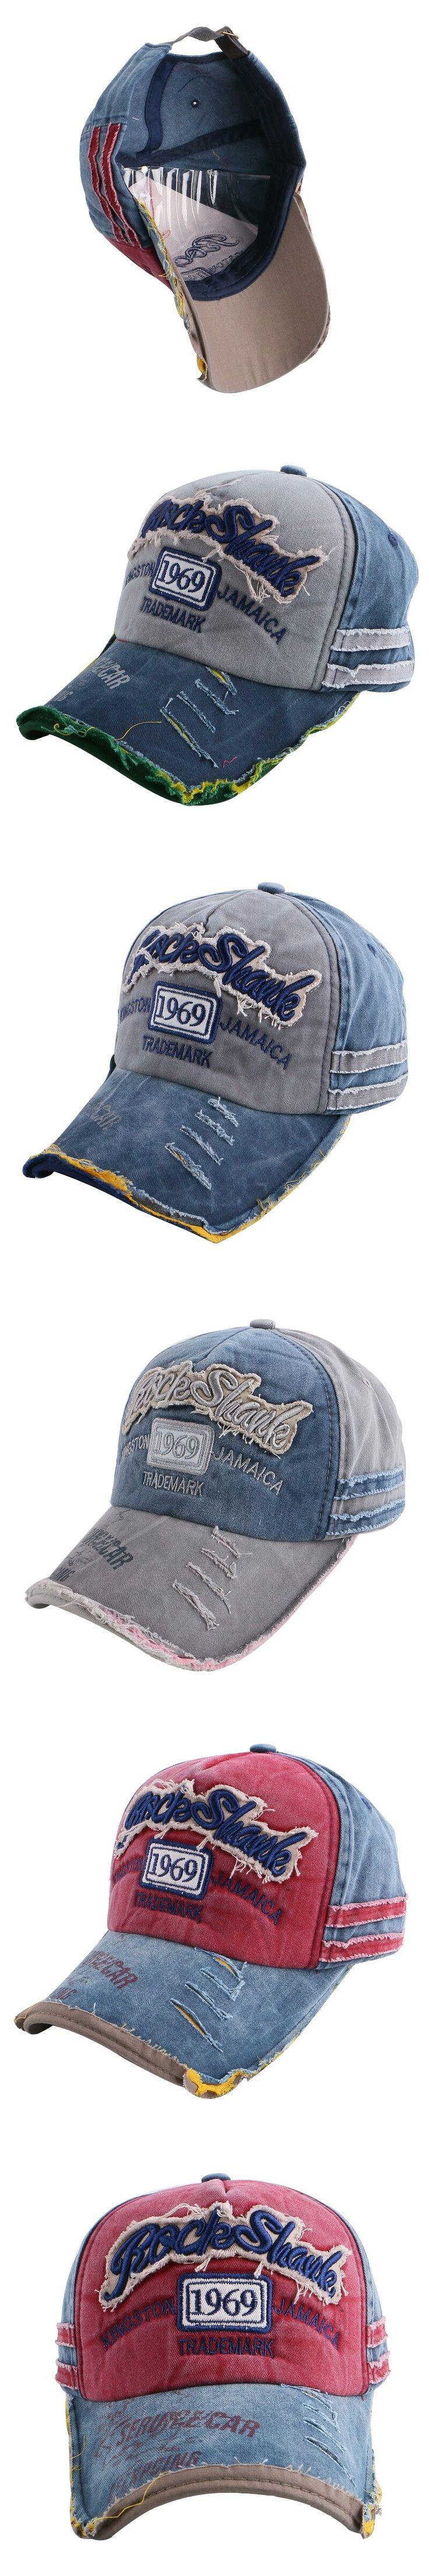 women men sports baseball cap embroidery letter cotton casual hats retro design outdoor snapback girl boy fashion strapback hat